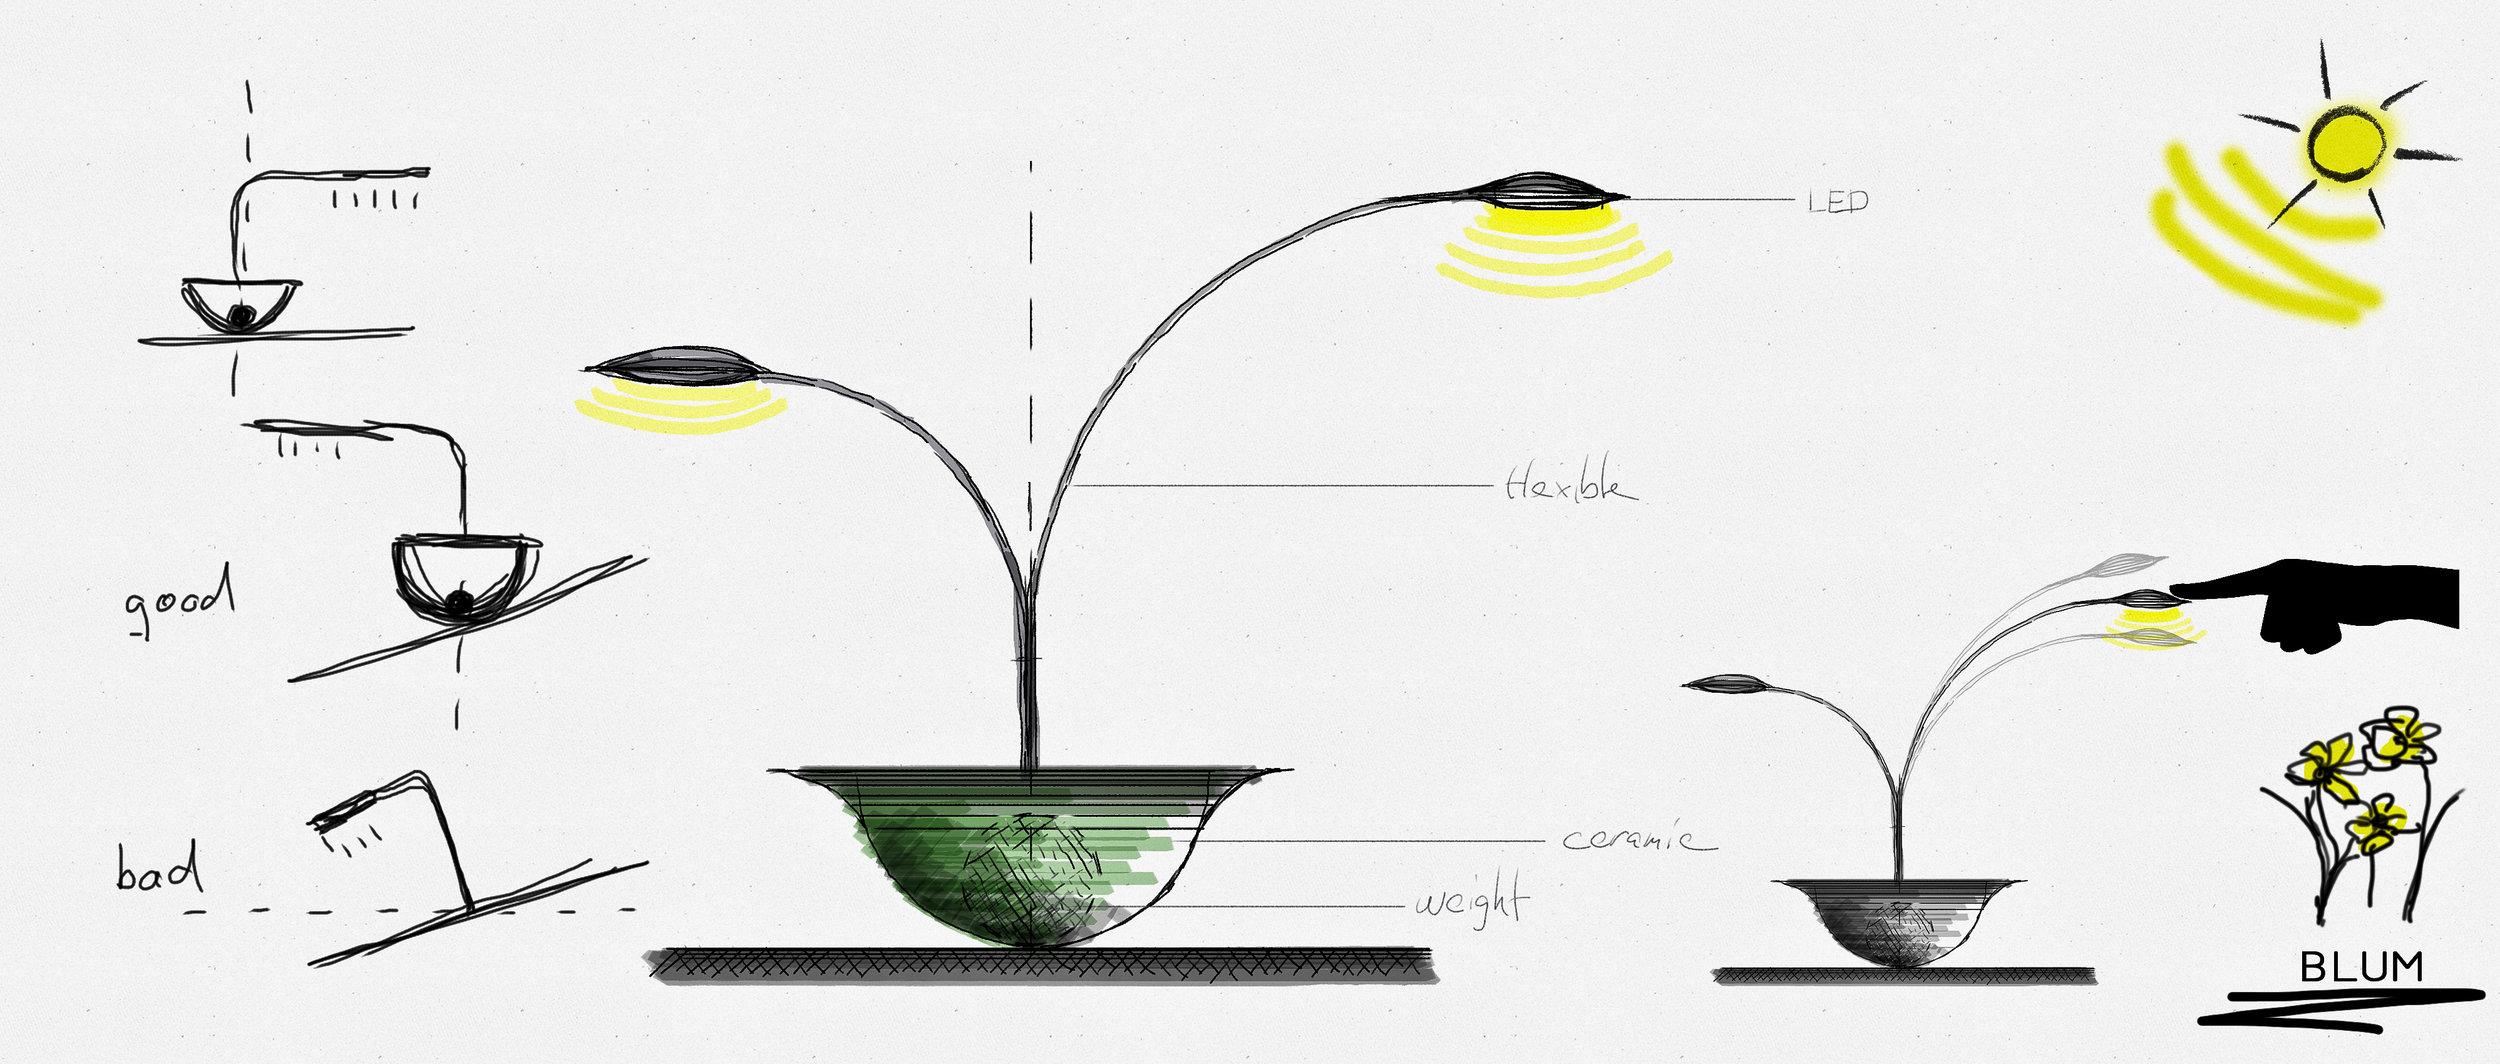 blume lamp design.jpg